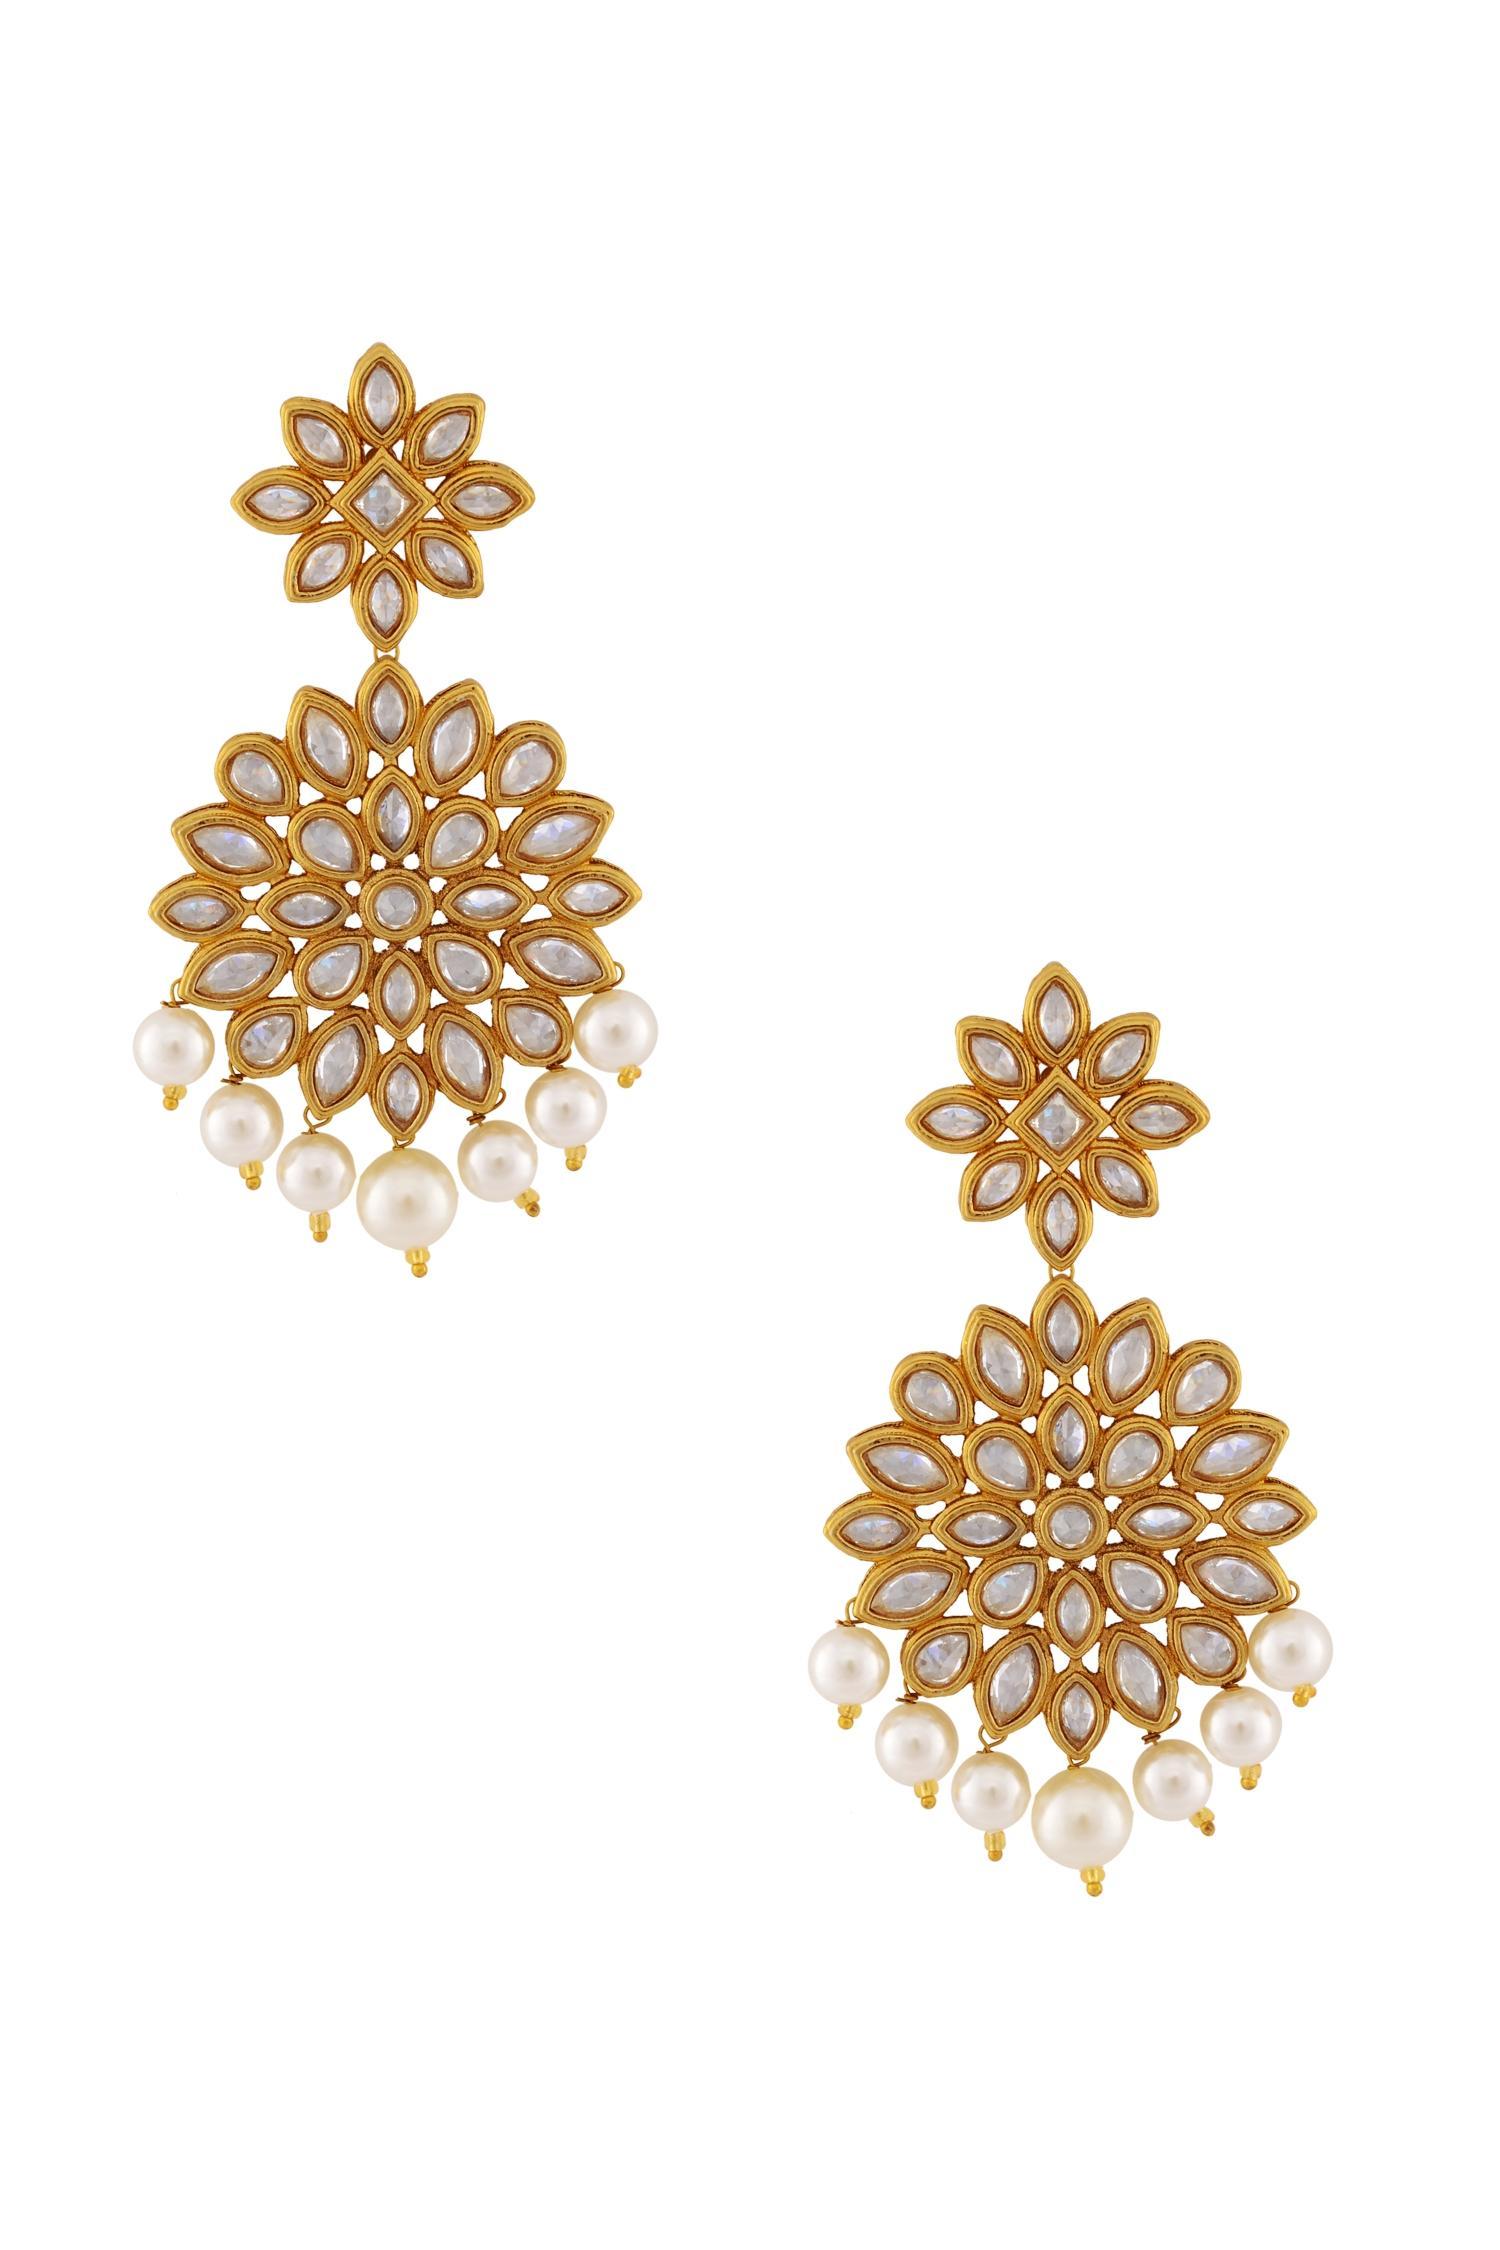 Shilpa Purii Collection